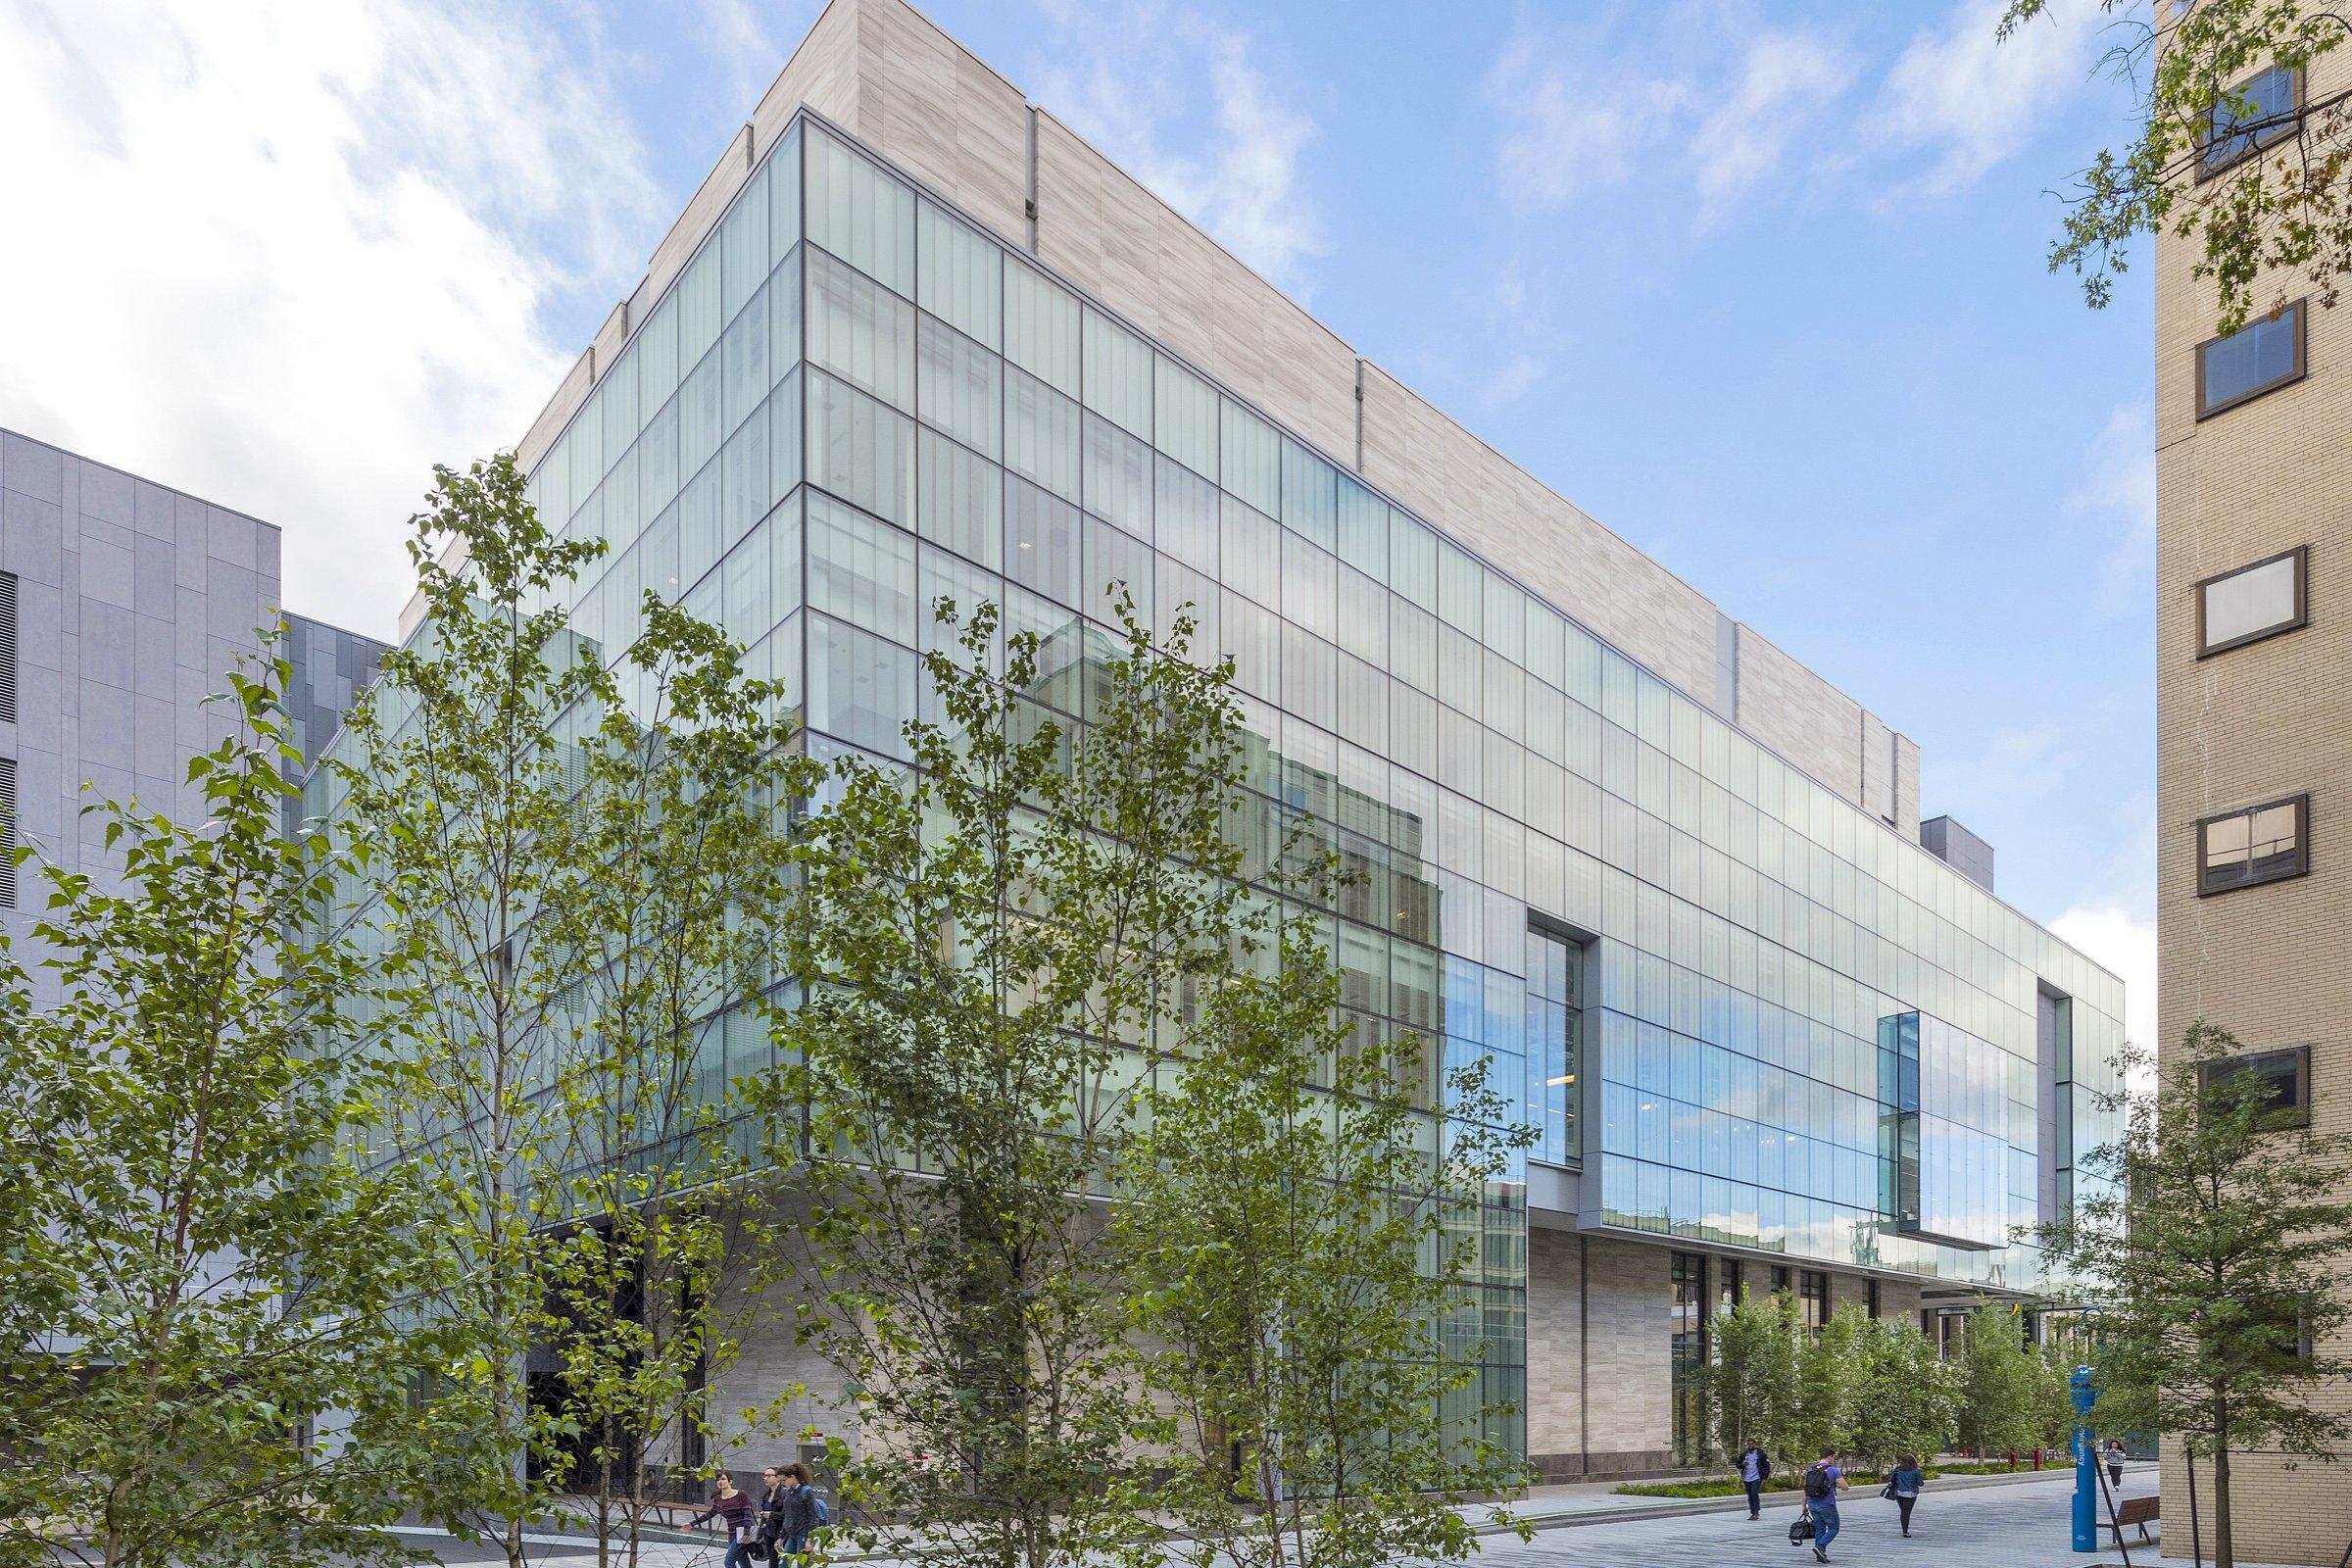 MIT.nano receives LEED Platinum certification